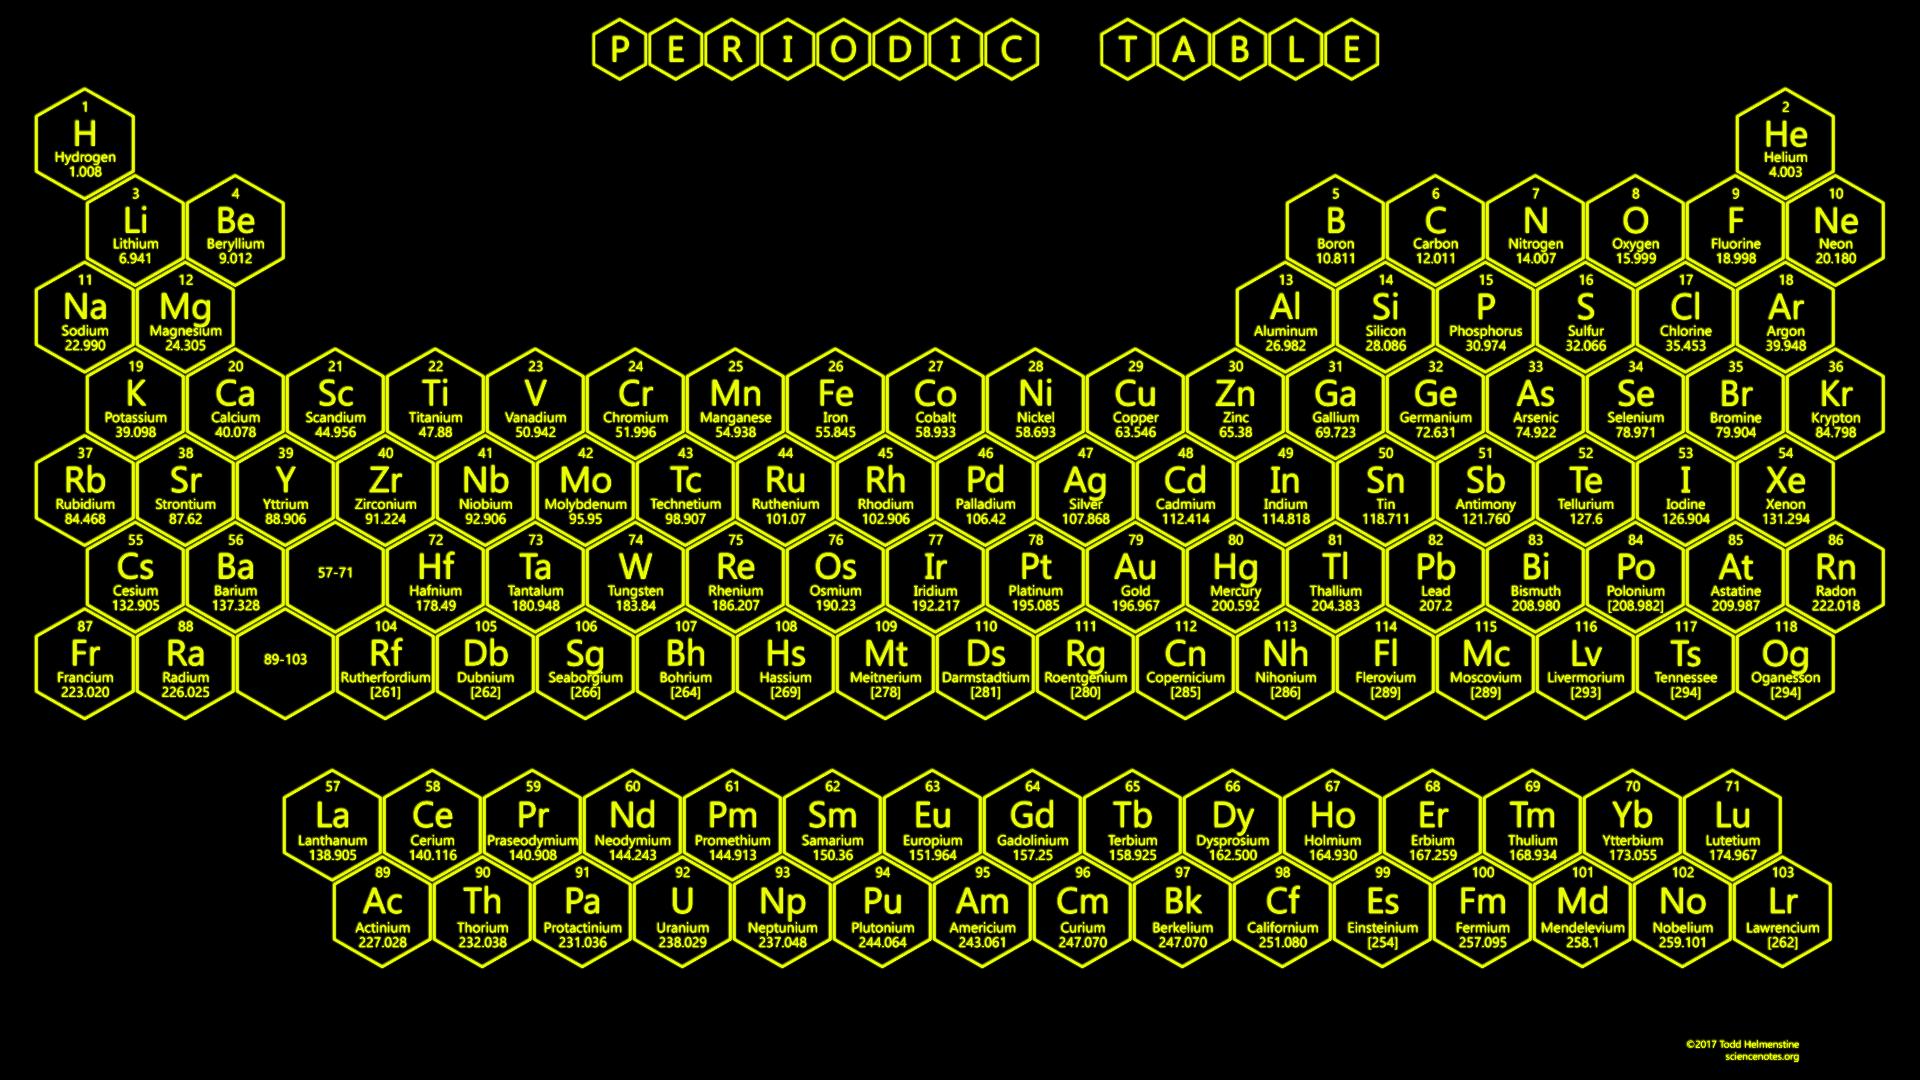 Yellow Neon Honeycomb Periodic Table - 2017 Edition